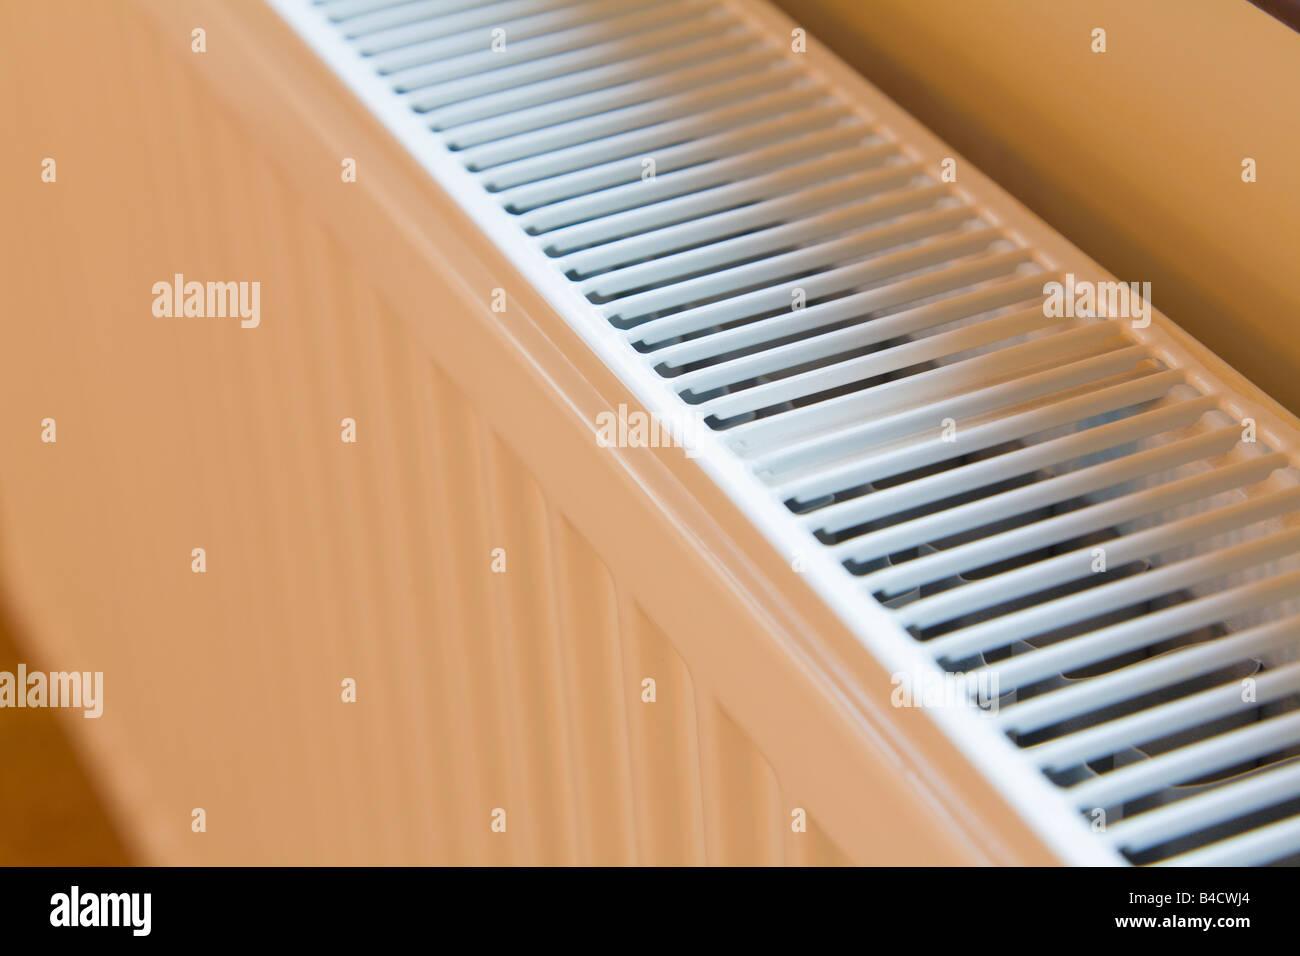 Central heating radiator - Stock Image